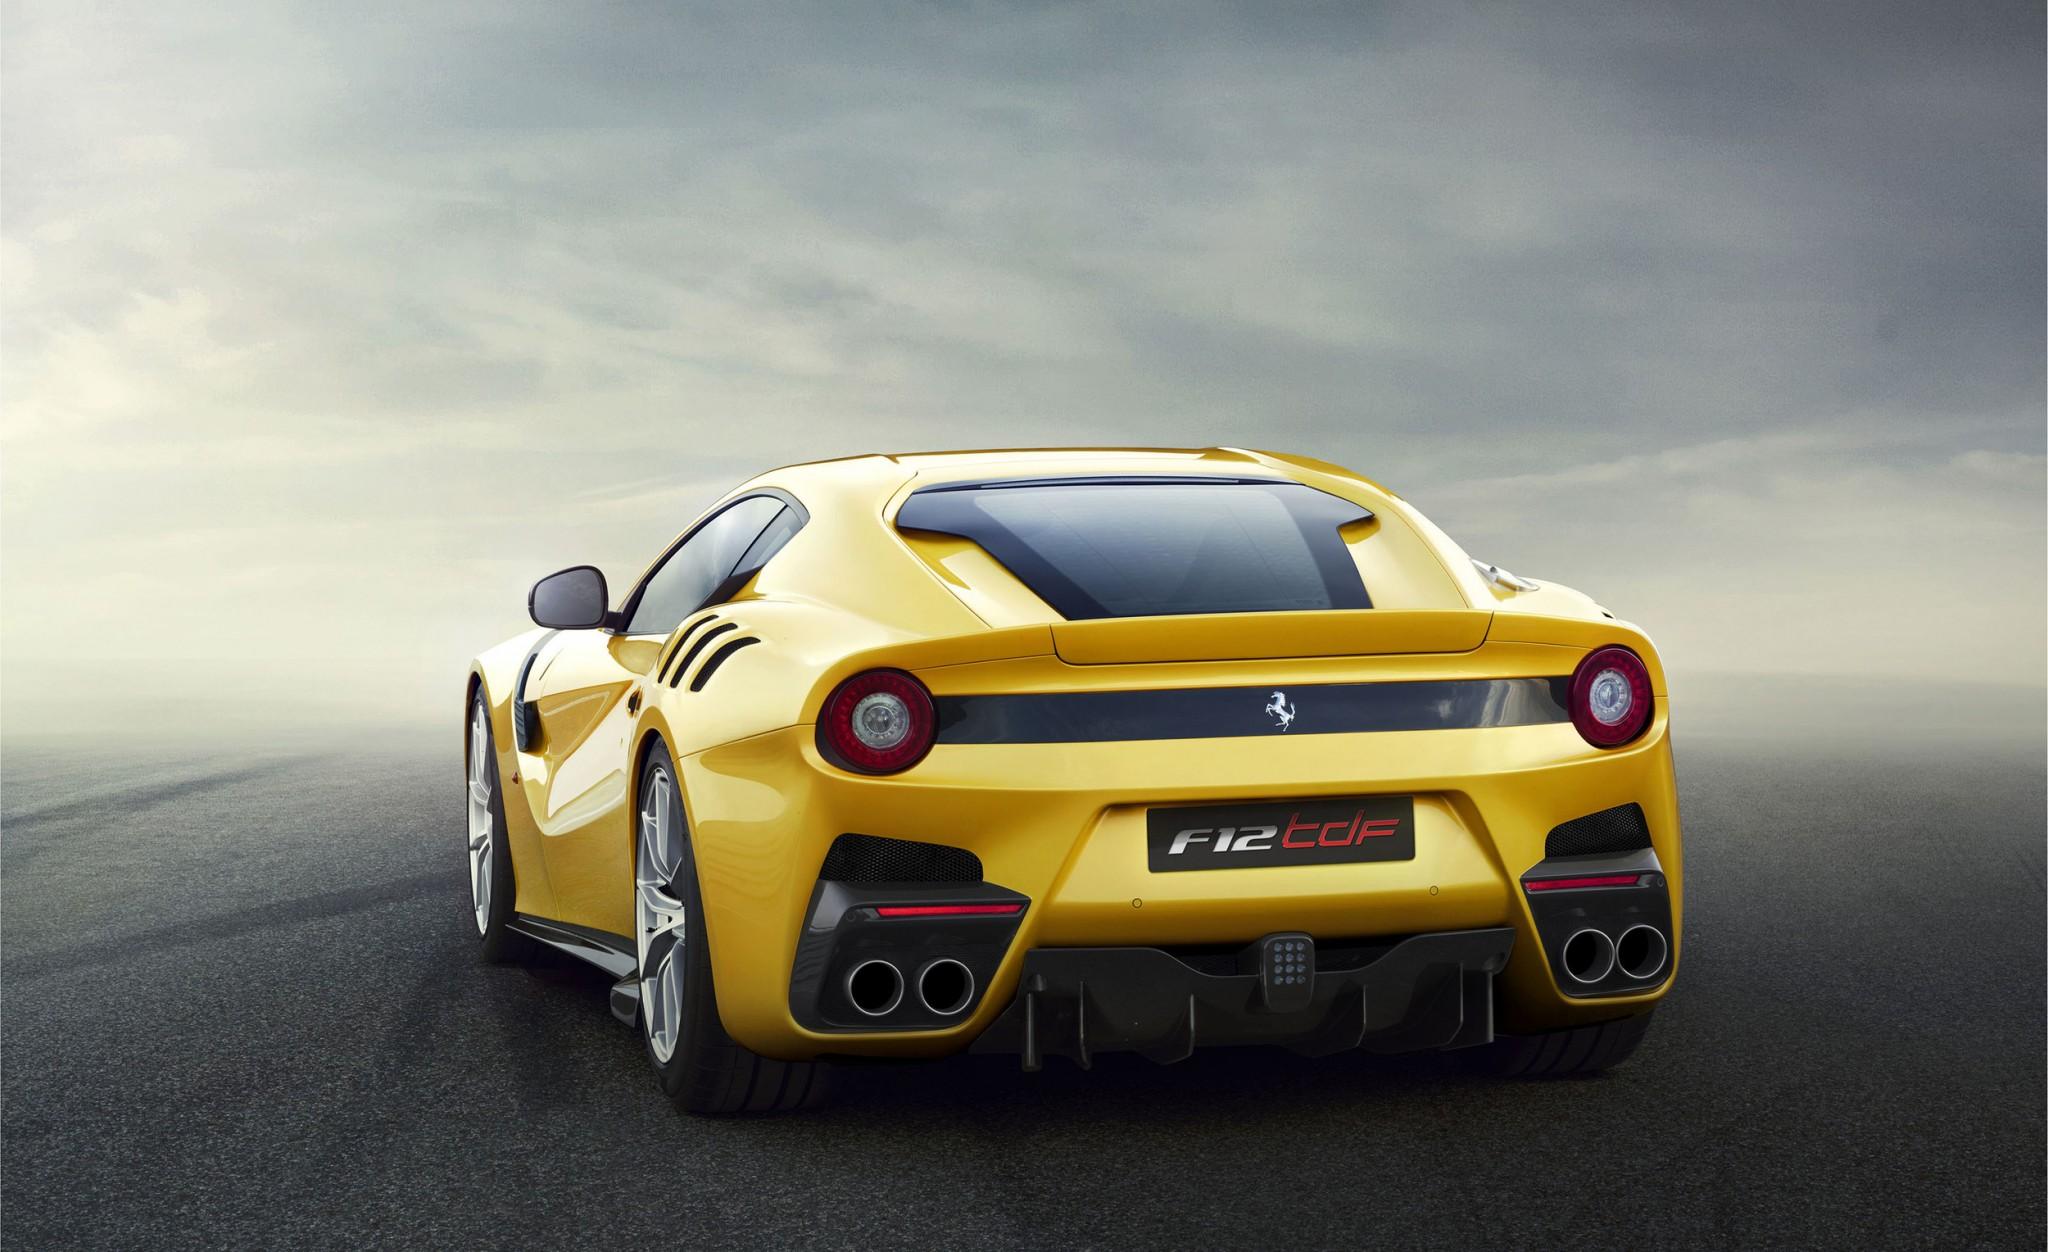 2015 Ferrari F12 TdF